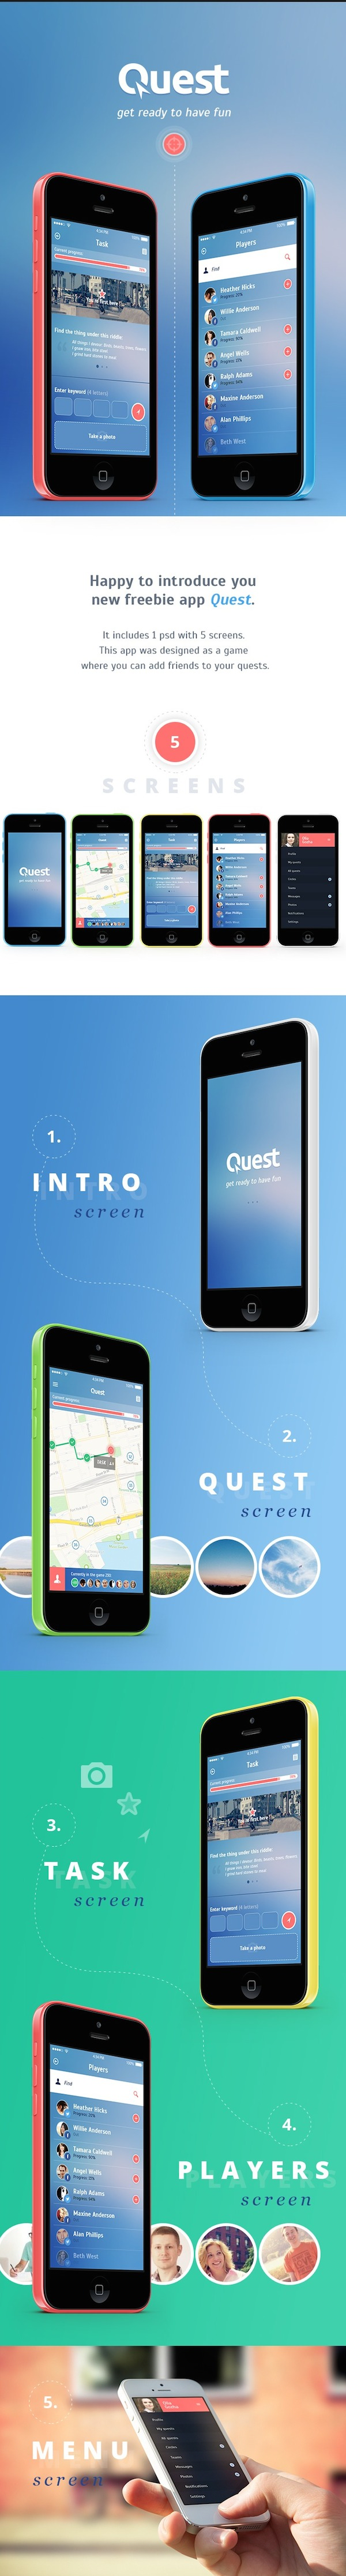 Free Mobile App Design Templates